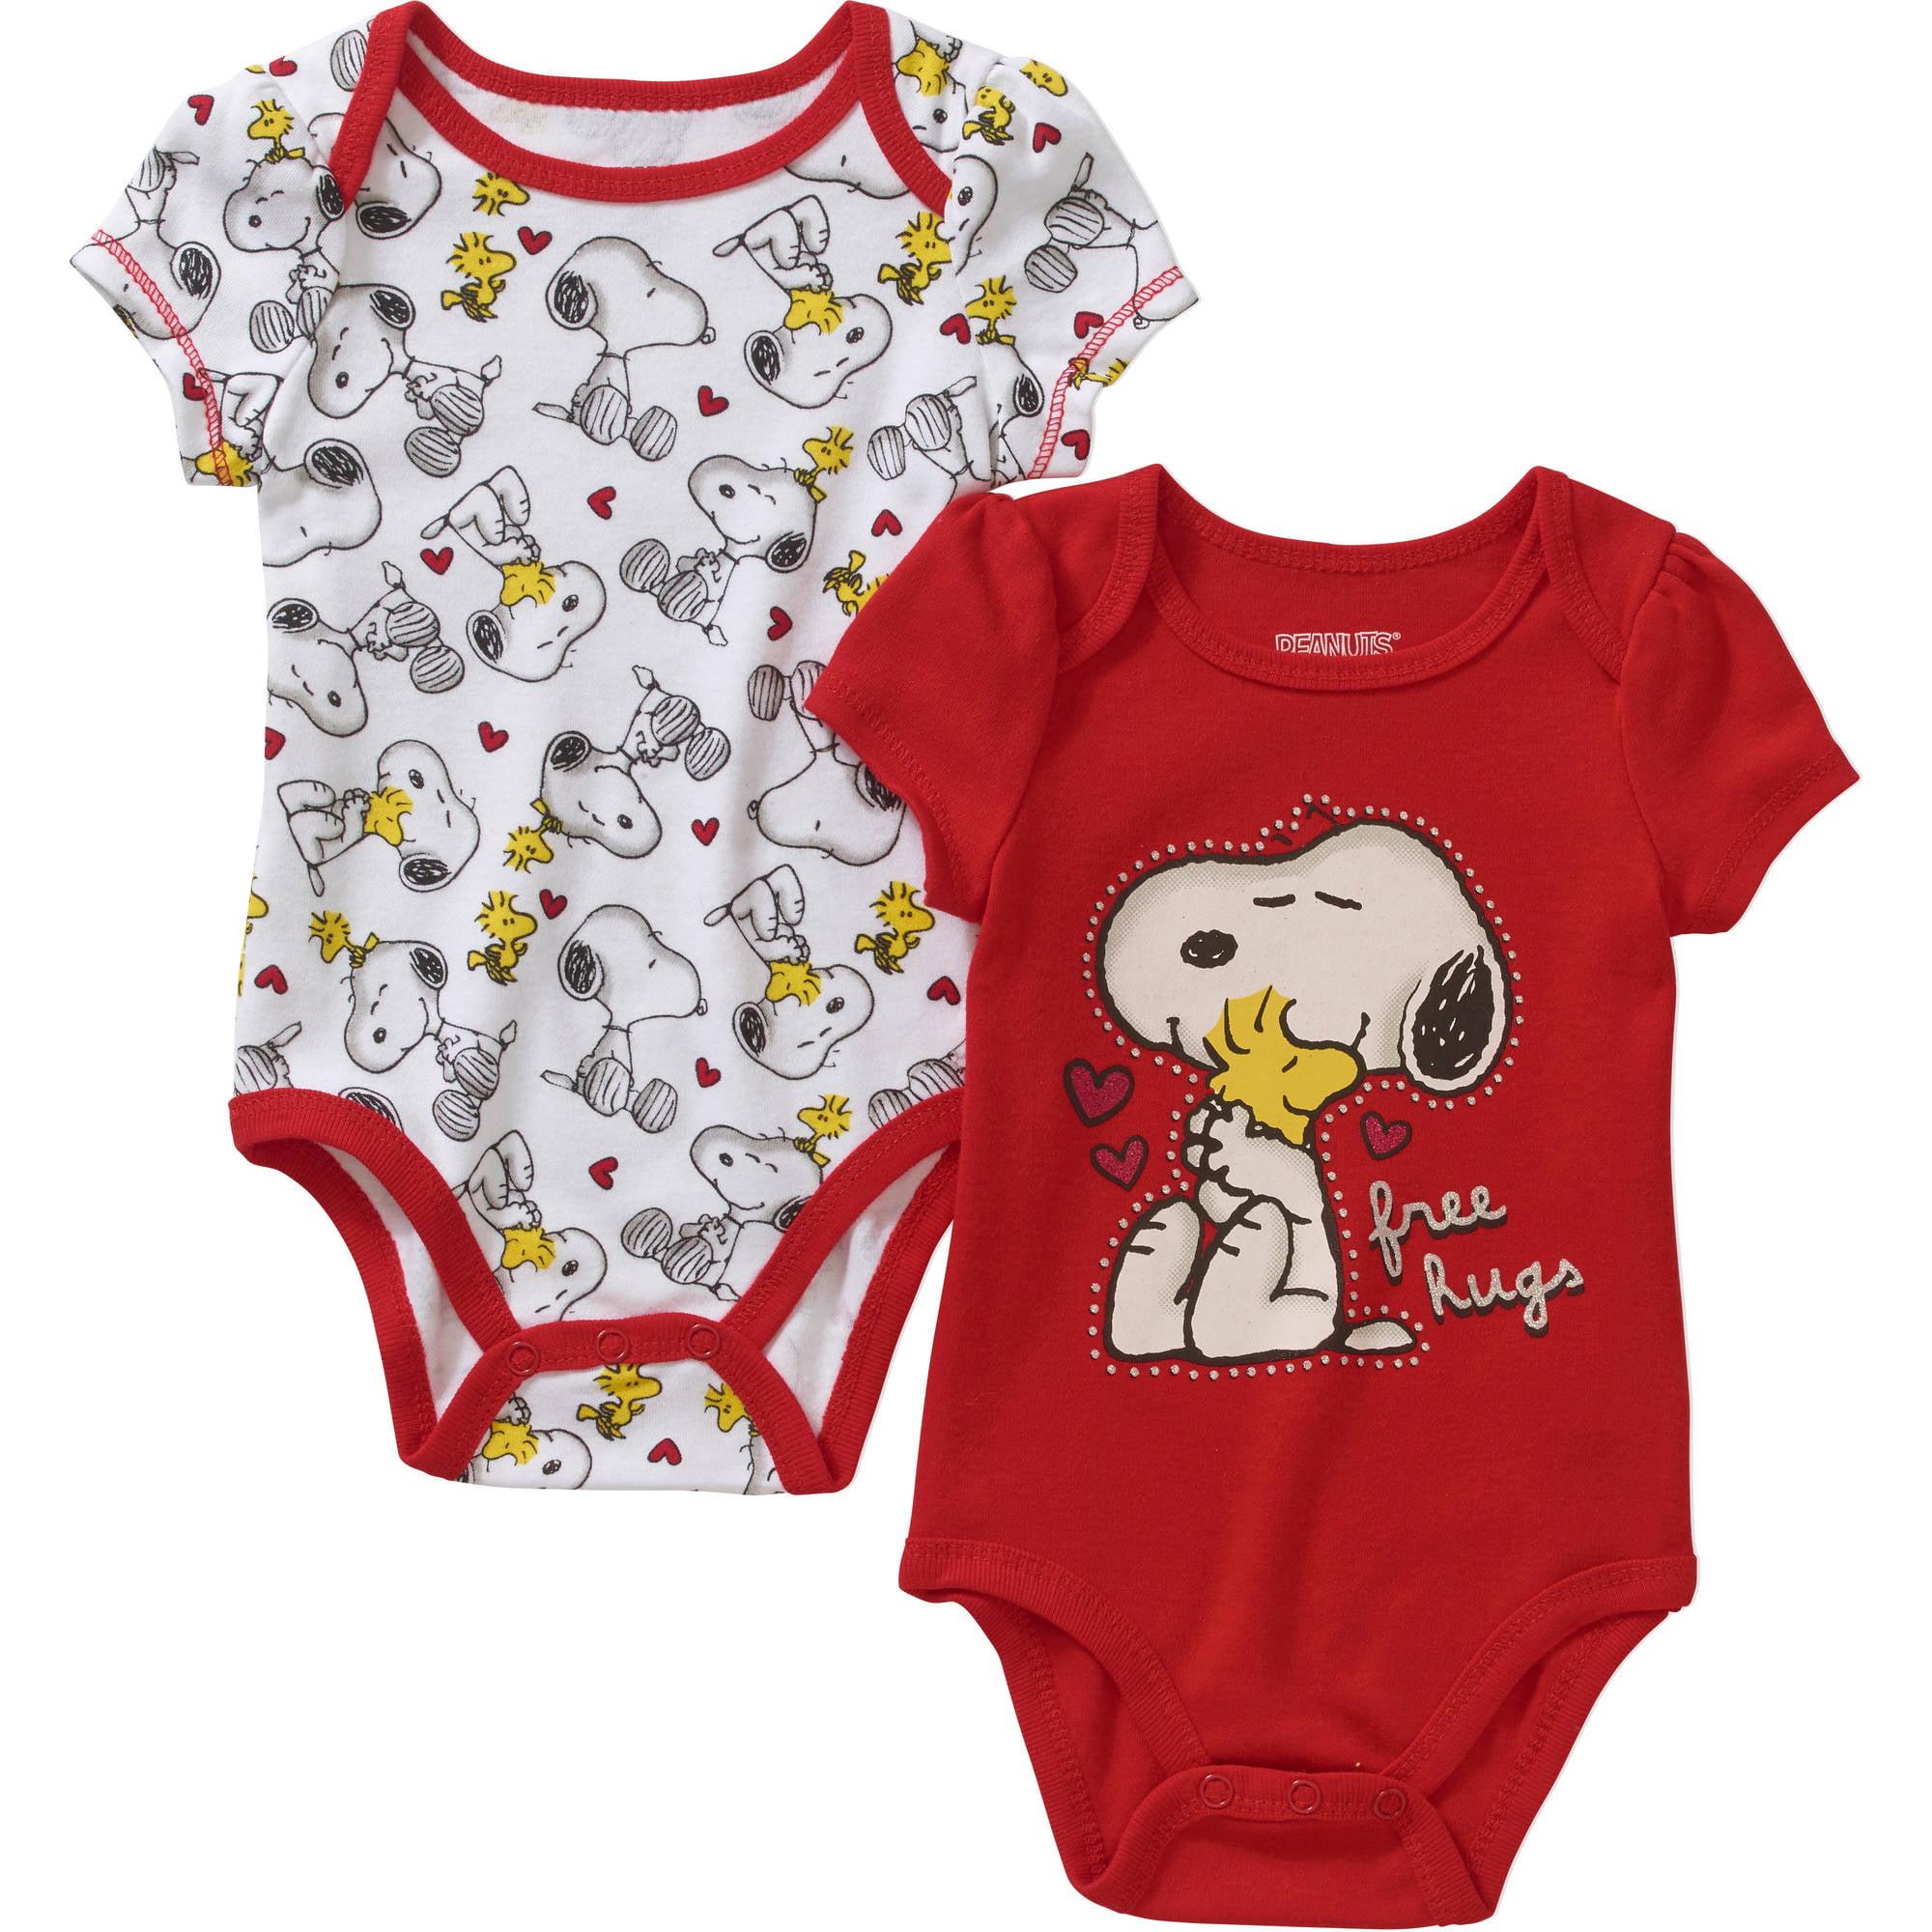 Peanuts Newborn Baby Girls Snoopy Short Sleeve Bodysuit 2